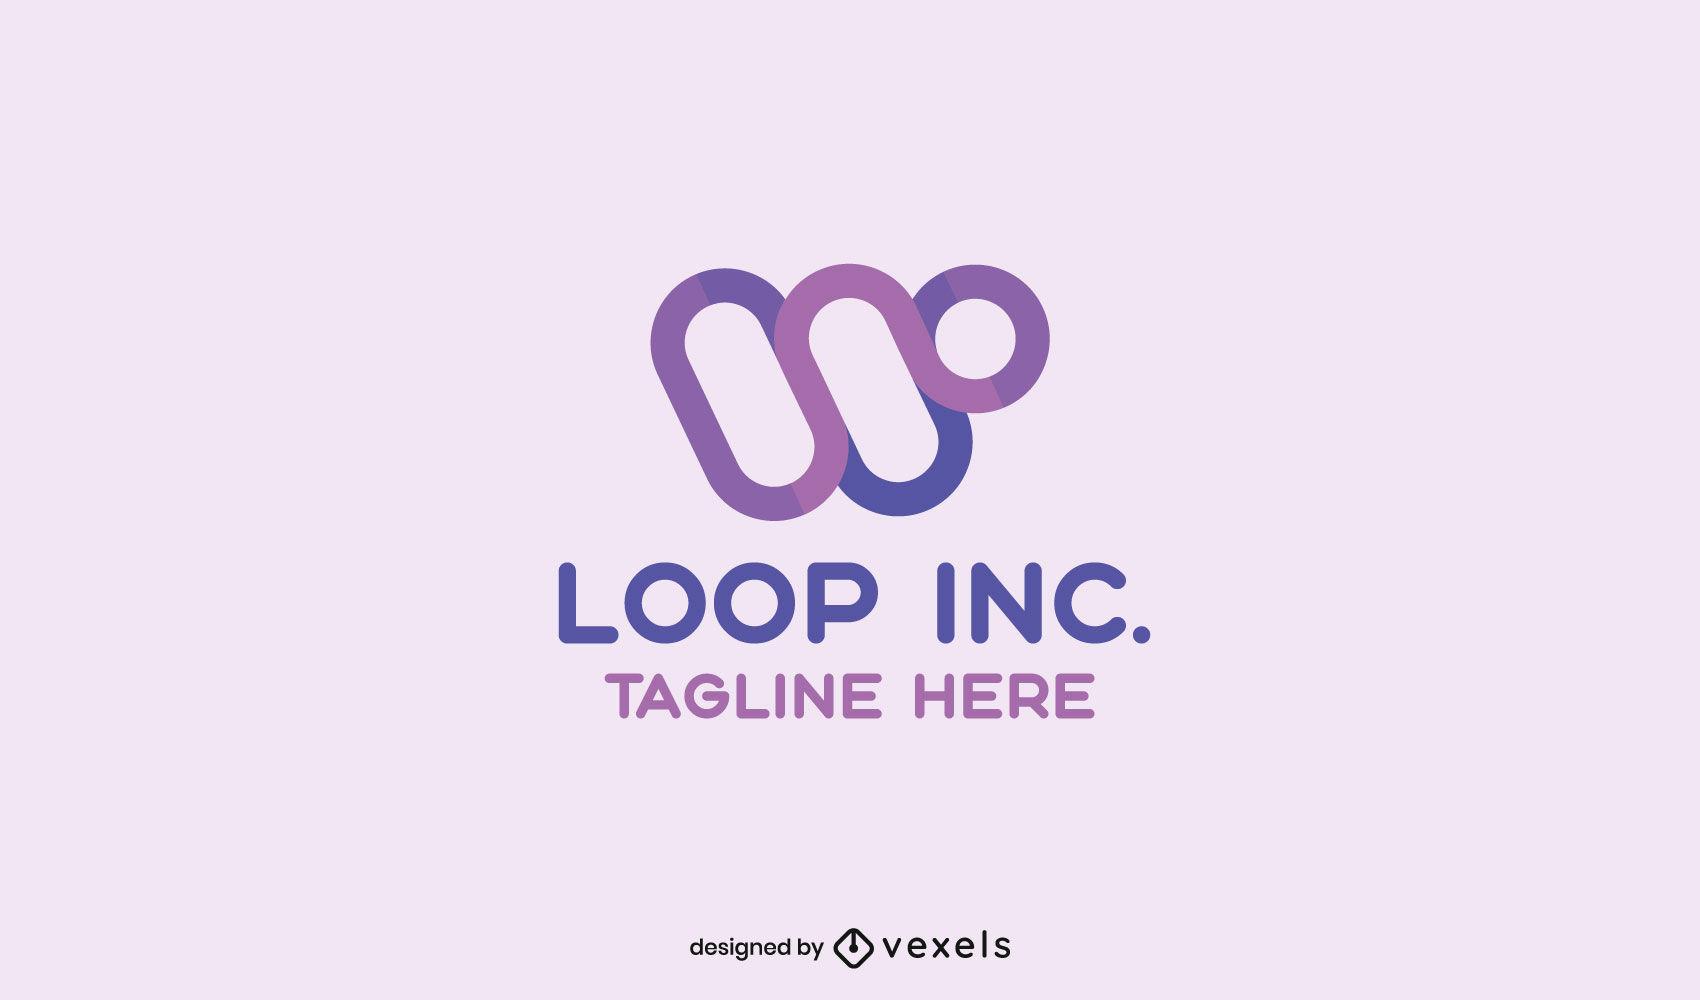 Generic circular shapes stroke logo template